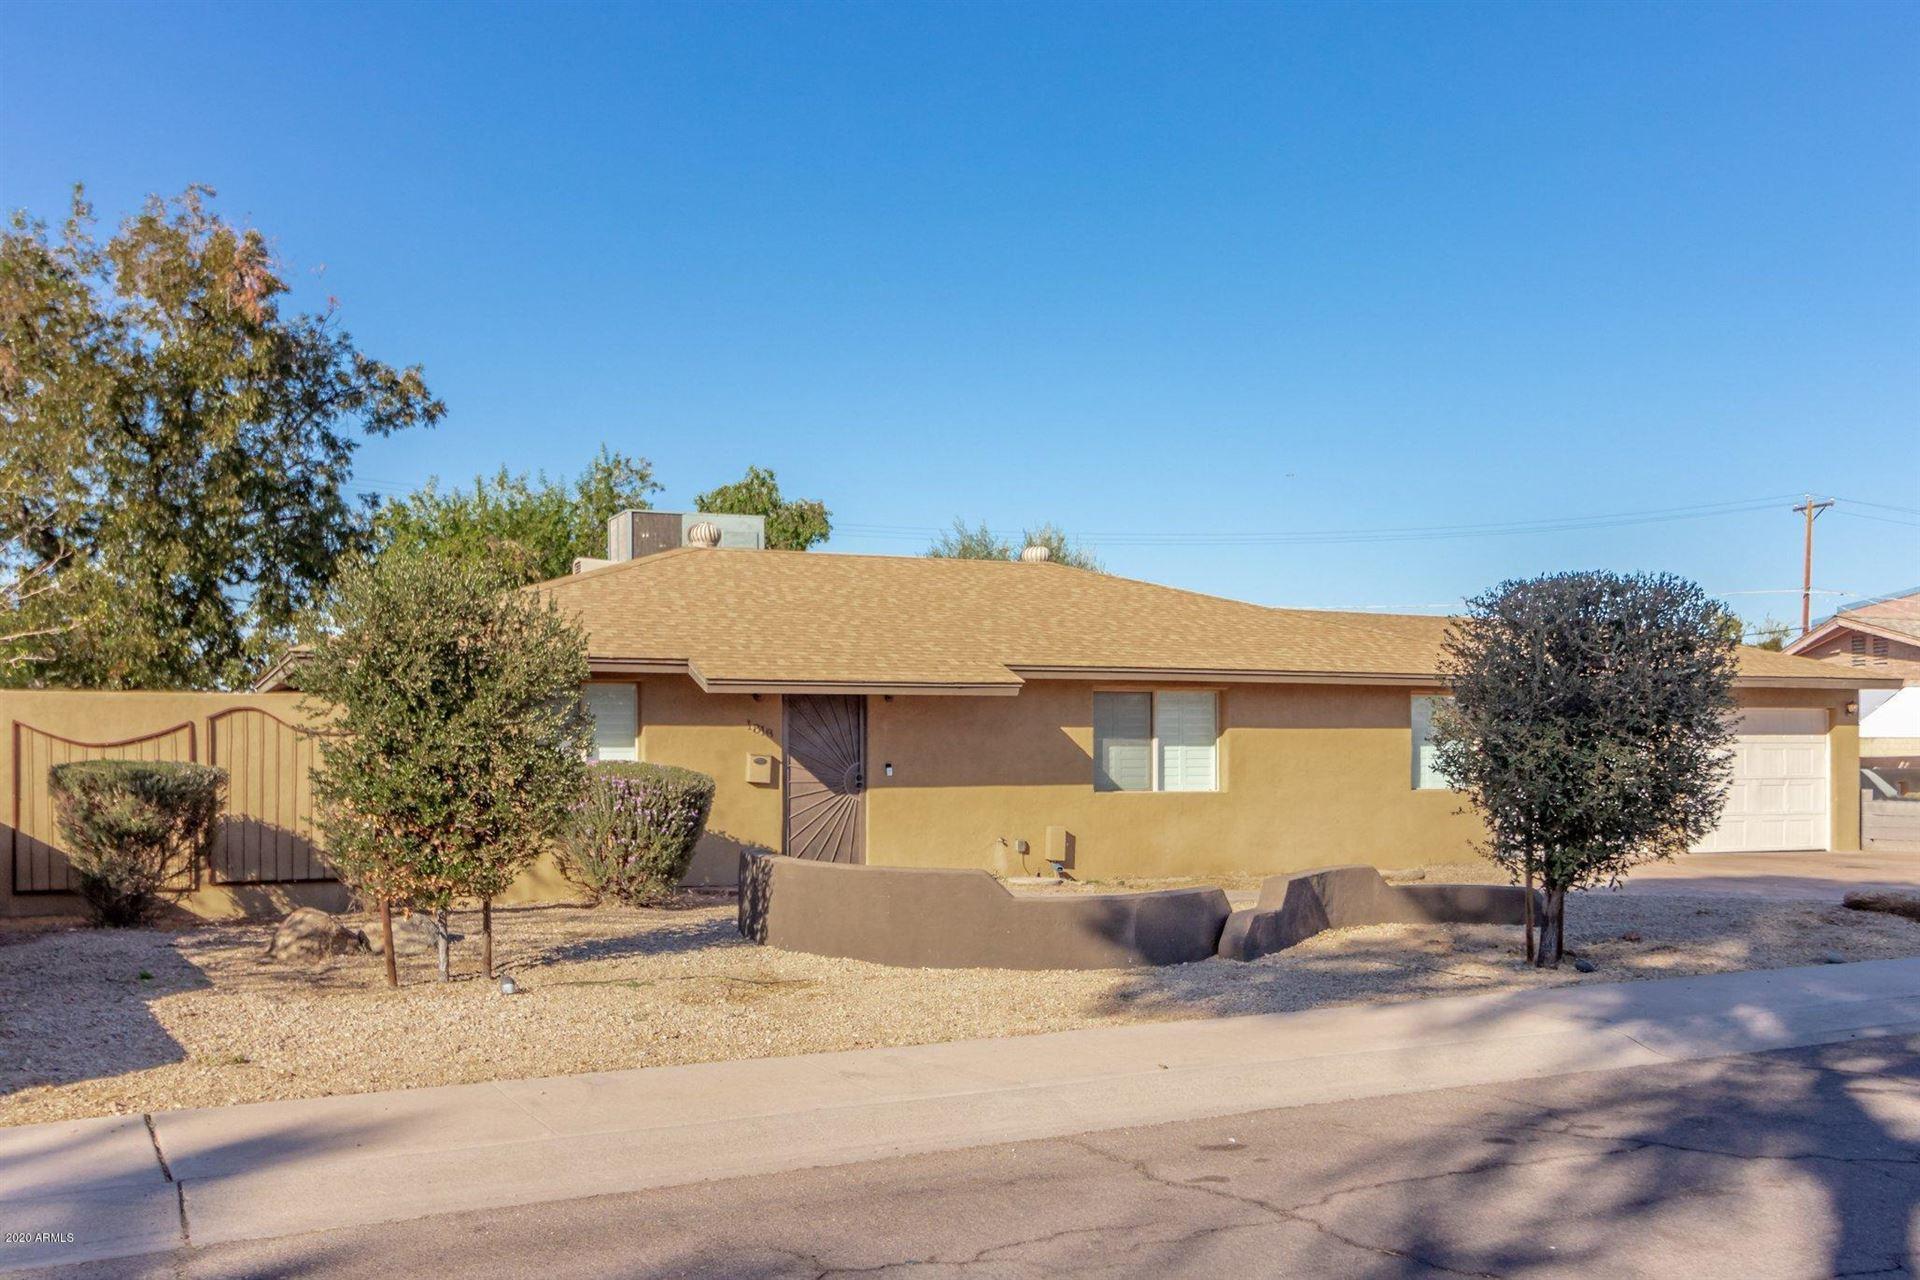 1818 W STATE Avenue, Phoenix, AZ 85021 - MLS#: 6160575